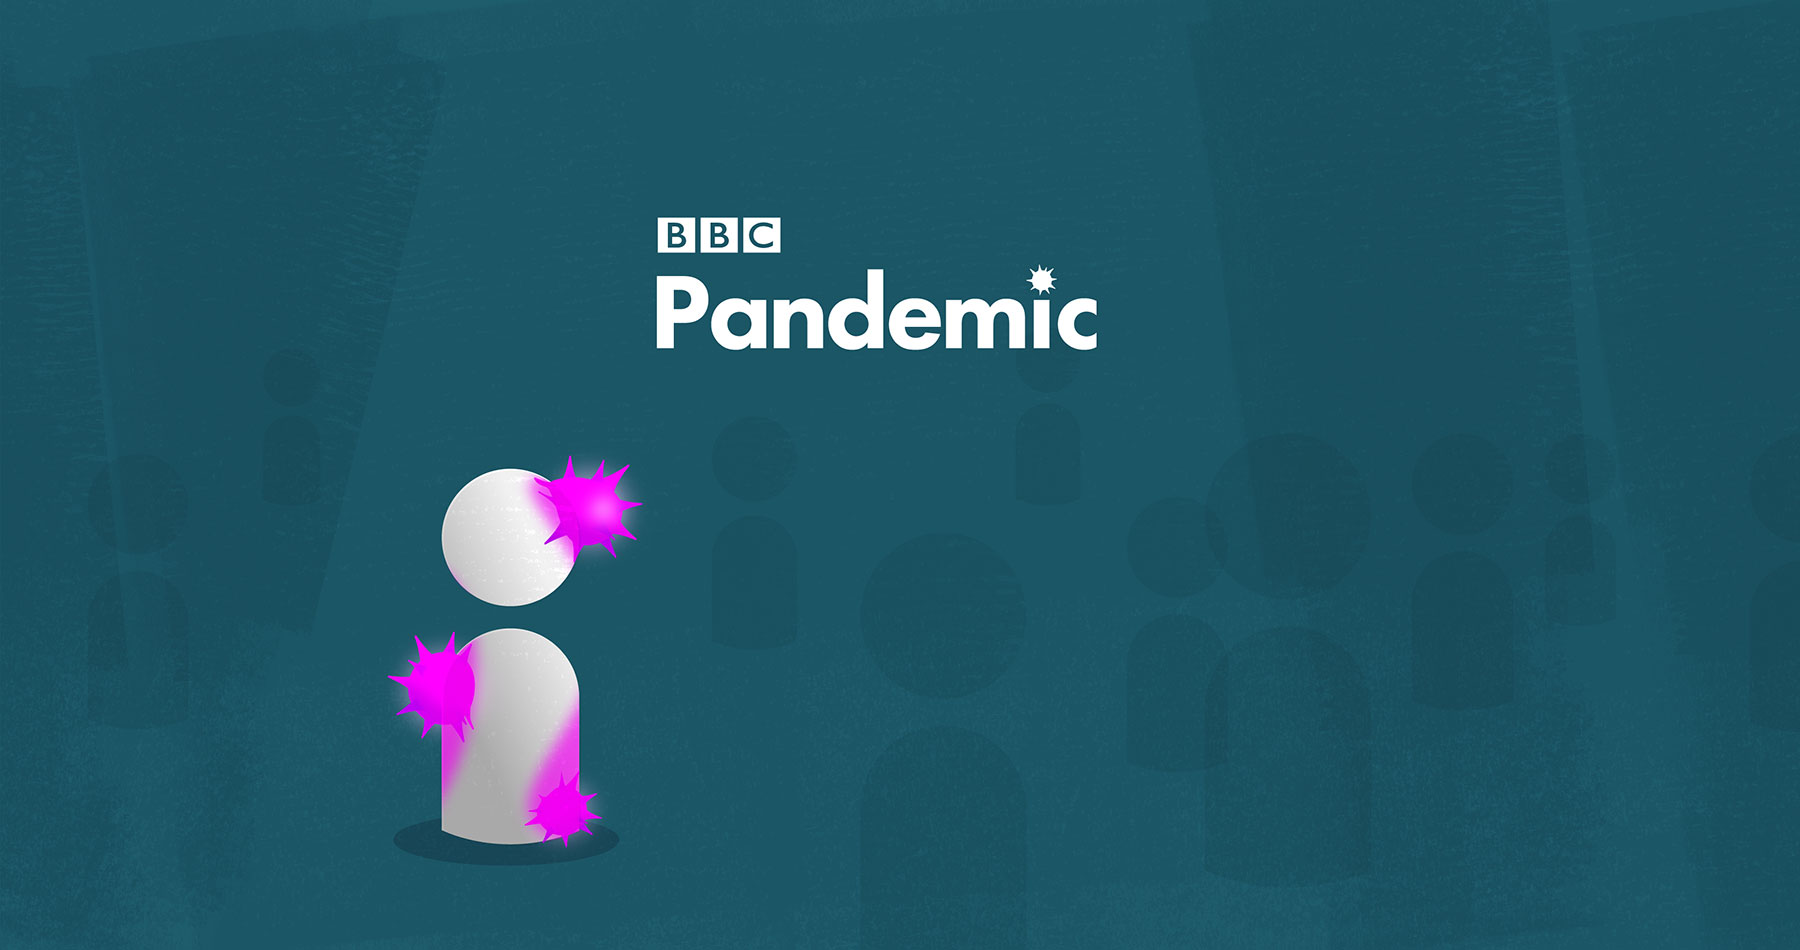 Big Motive Blog - BBC Pandemic